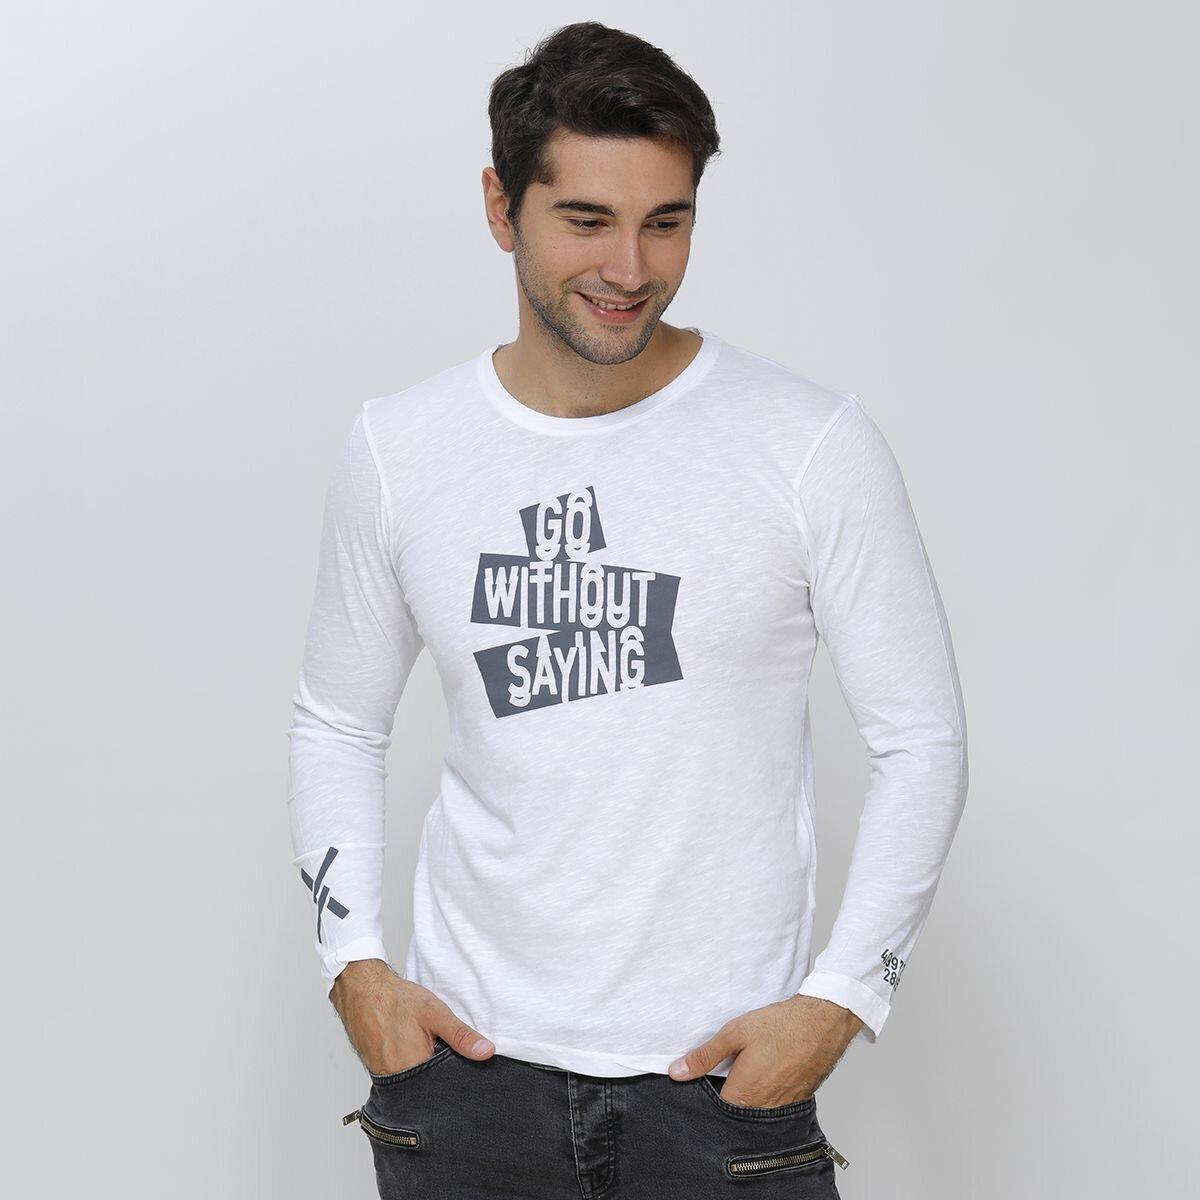 BEYAZ Erkek Sweatshirt 85112